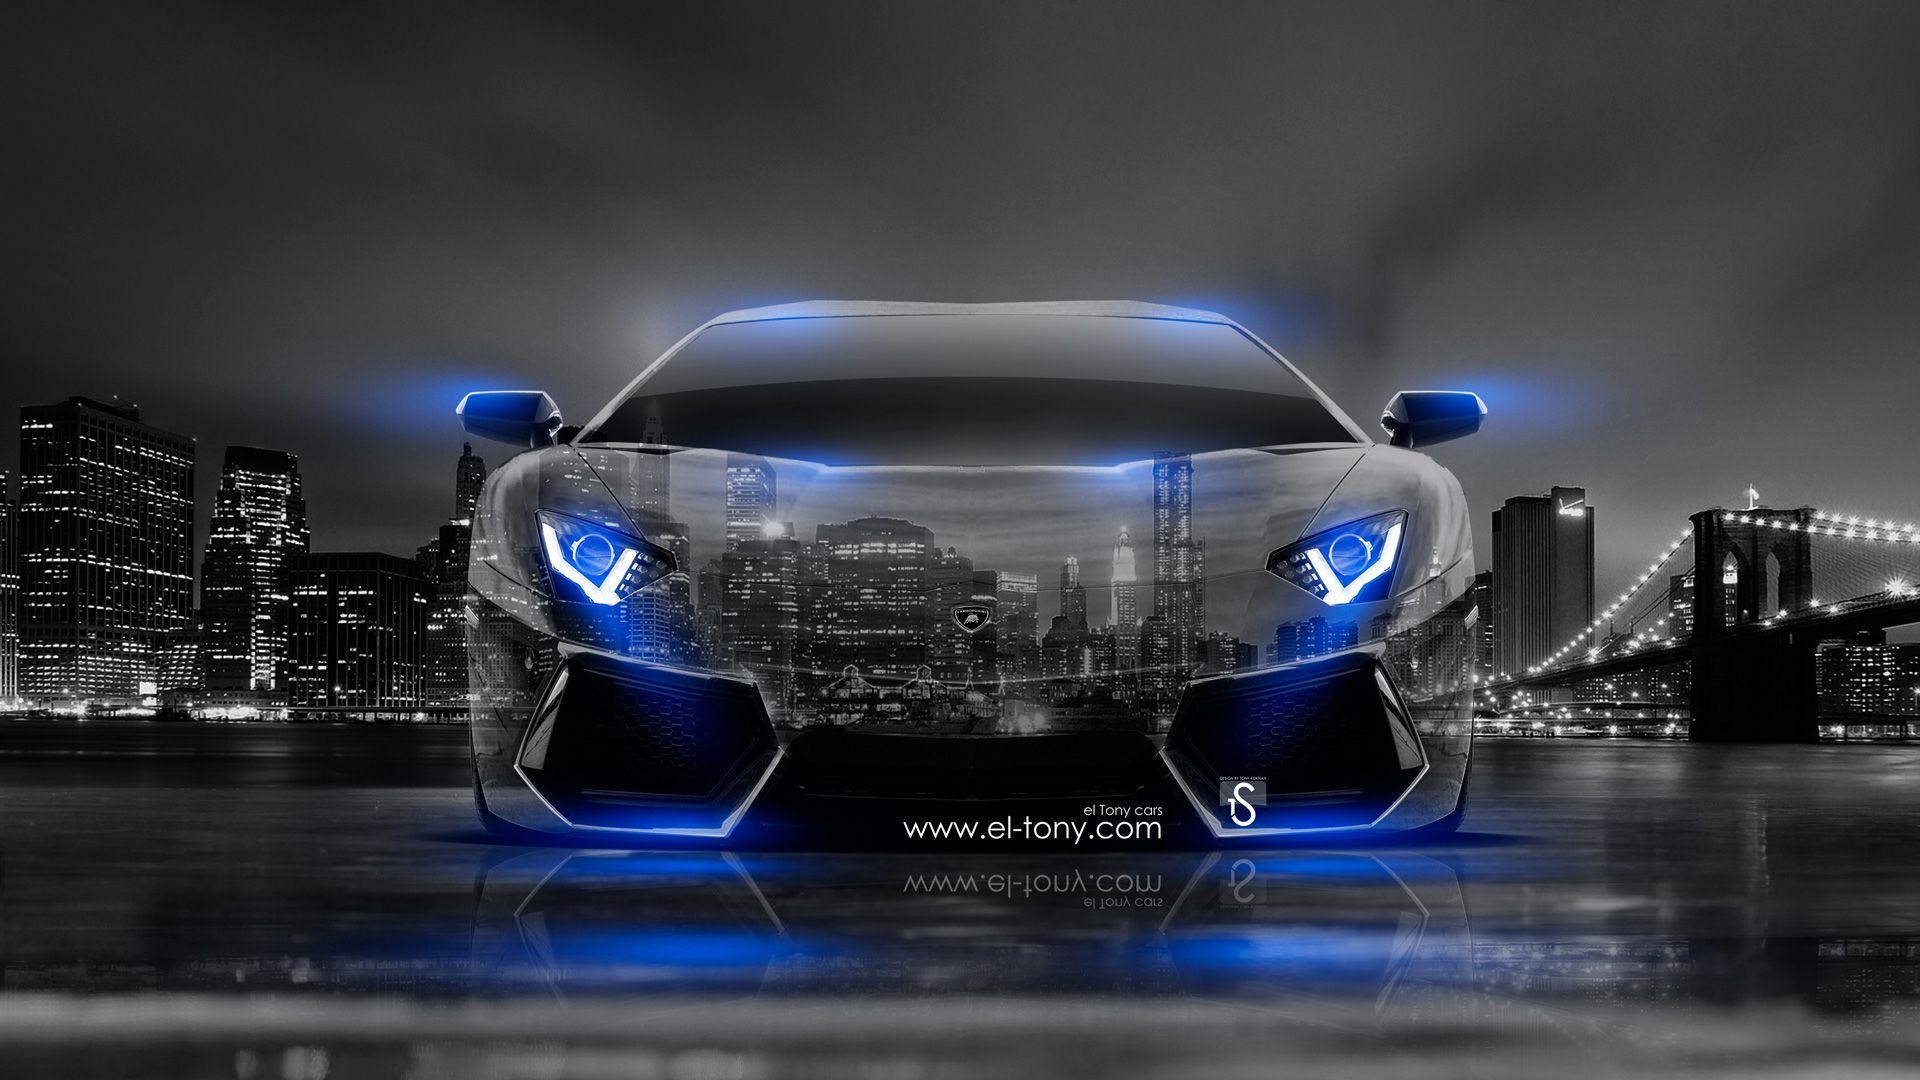 Bon Black Lamborghini With Neon Blue Lights